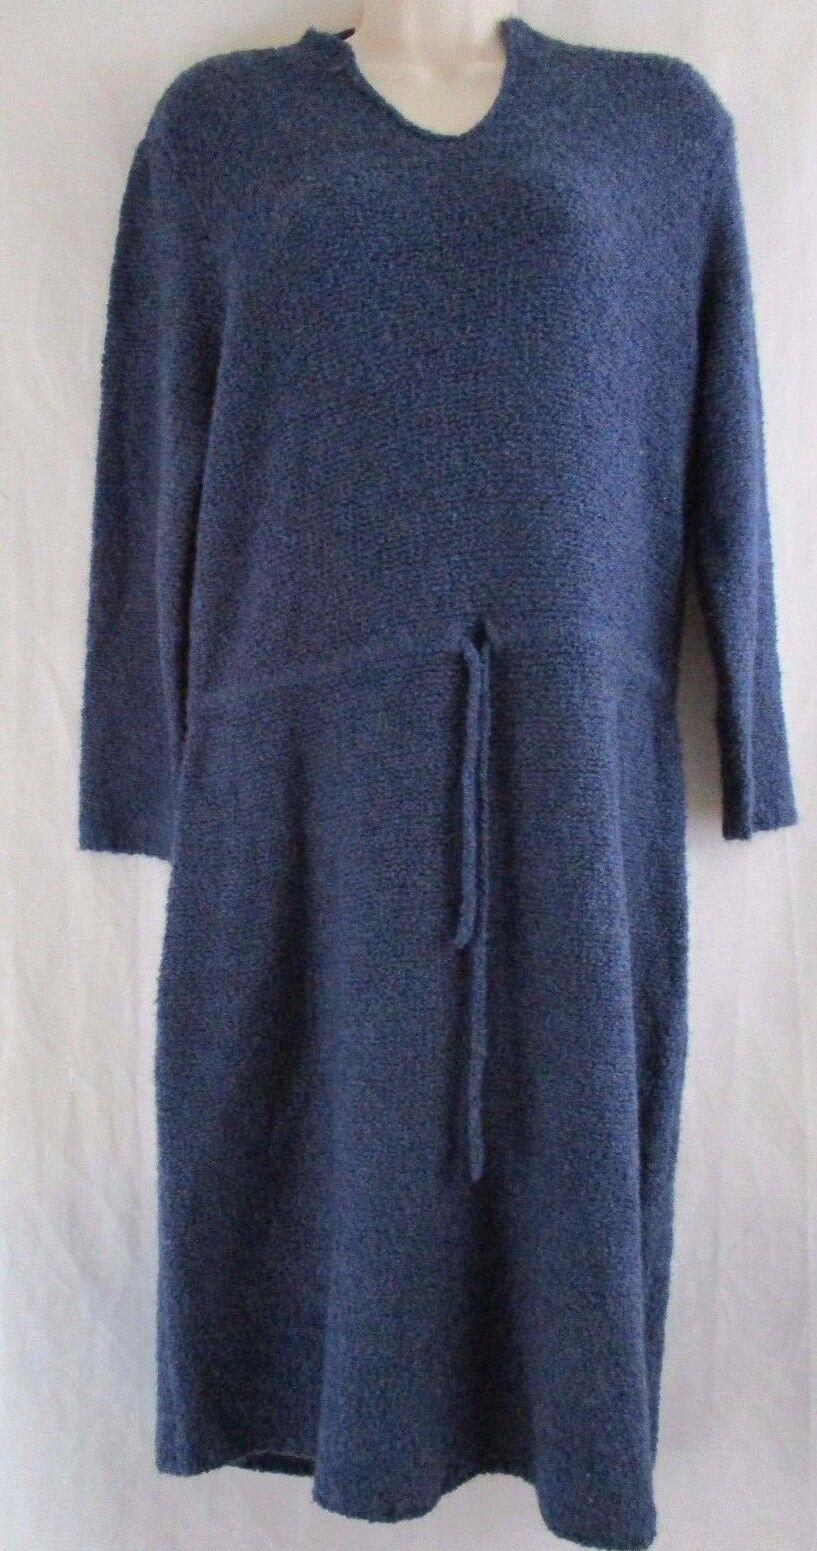 J. McLaughlin Montaine 3 4 Sleeve Notch Collar Tunic Blau Dress Größe L    b6